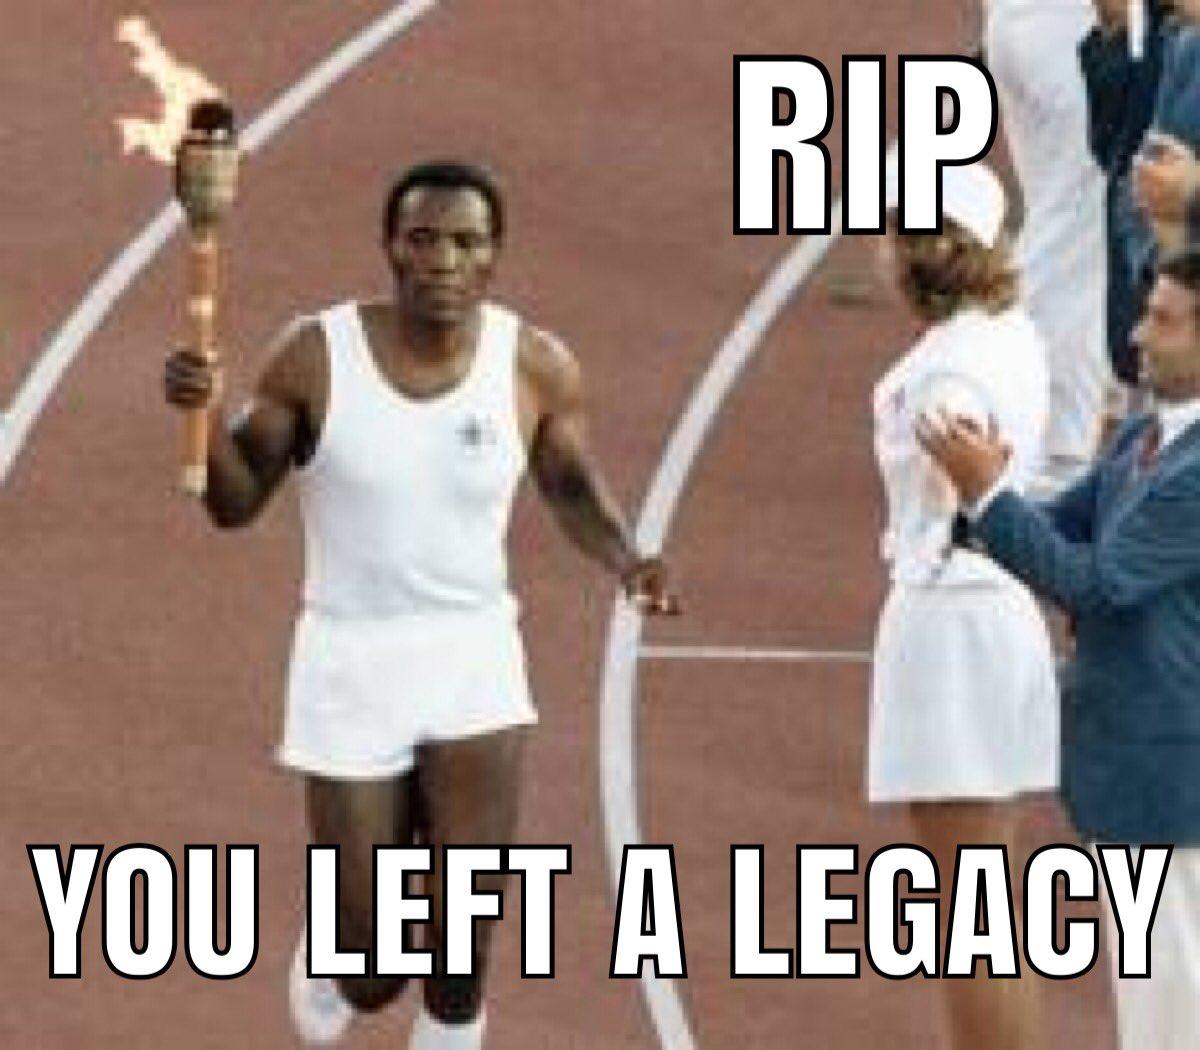 #RaferJohnson #Olympics #JFKassassination #cannabisismedicine https://t.co/Vuh8JHk44j